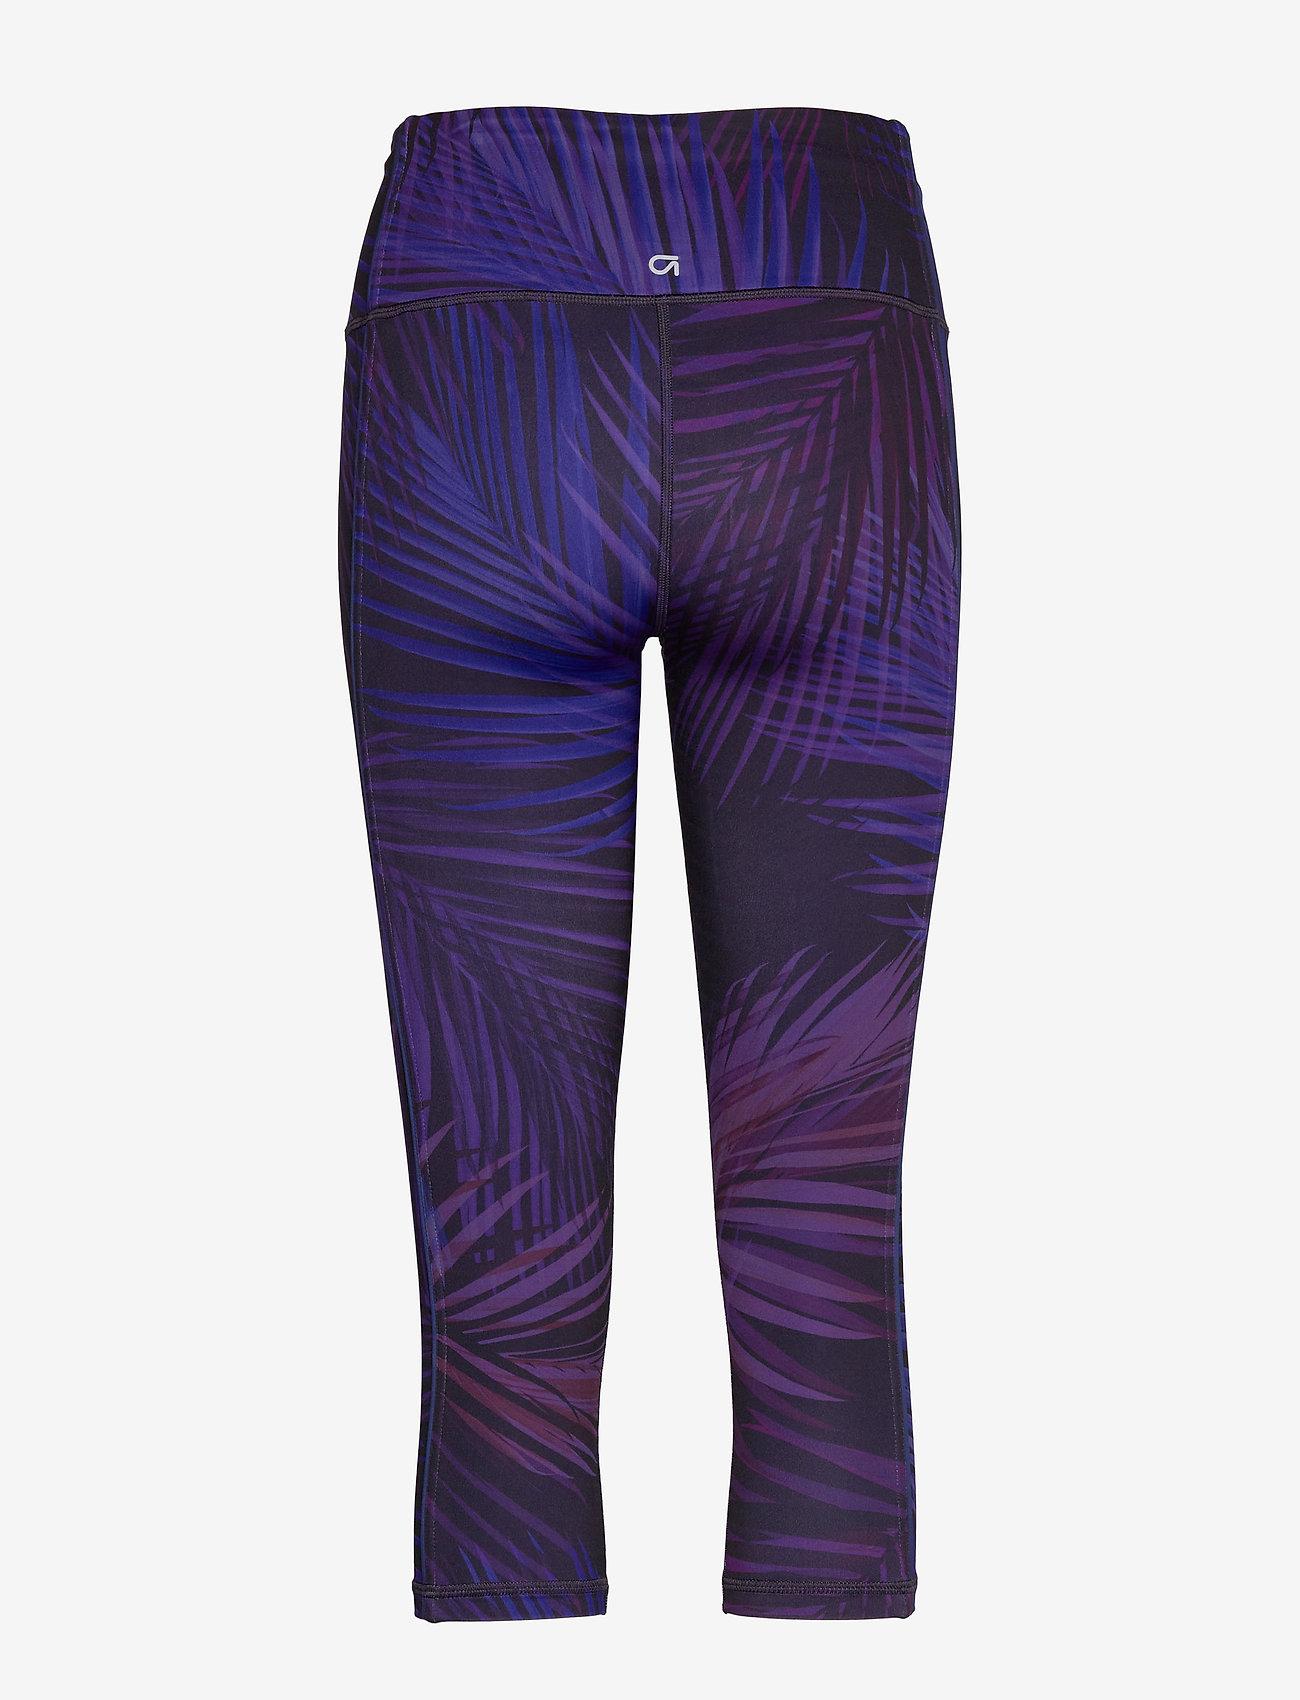 GAP - GapFit High Rise Capris in Eclipse - running & training tights - indigo palm print - 1